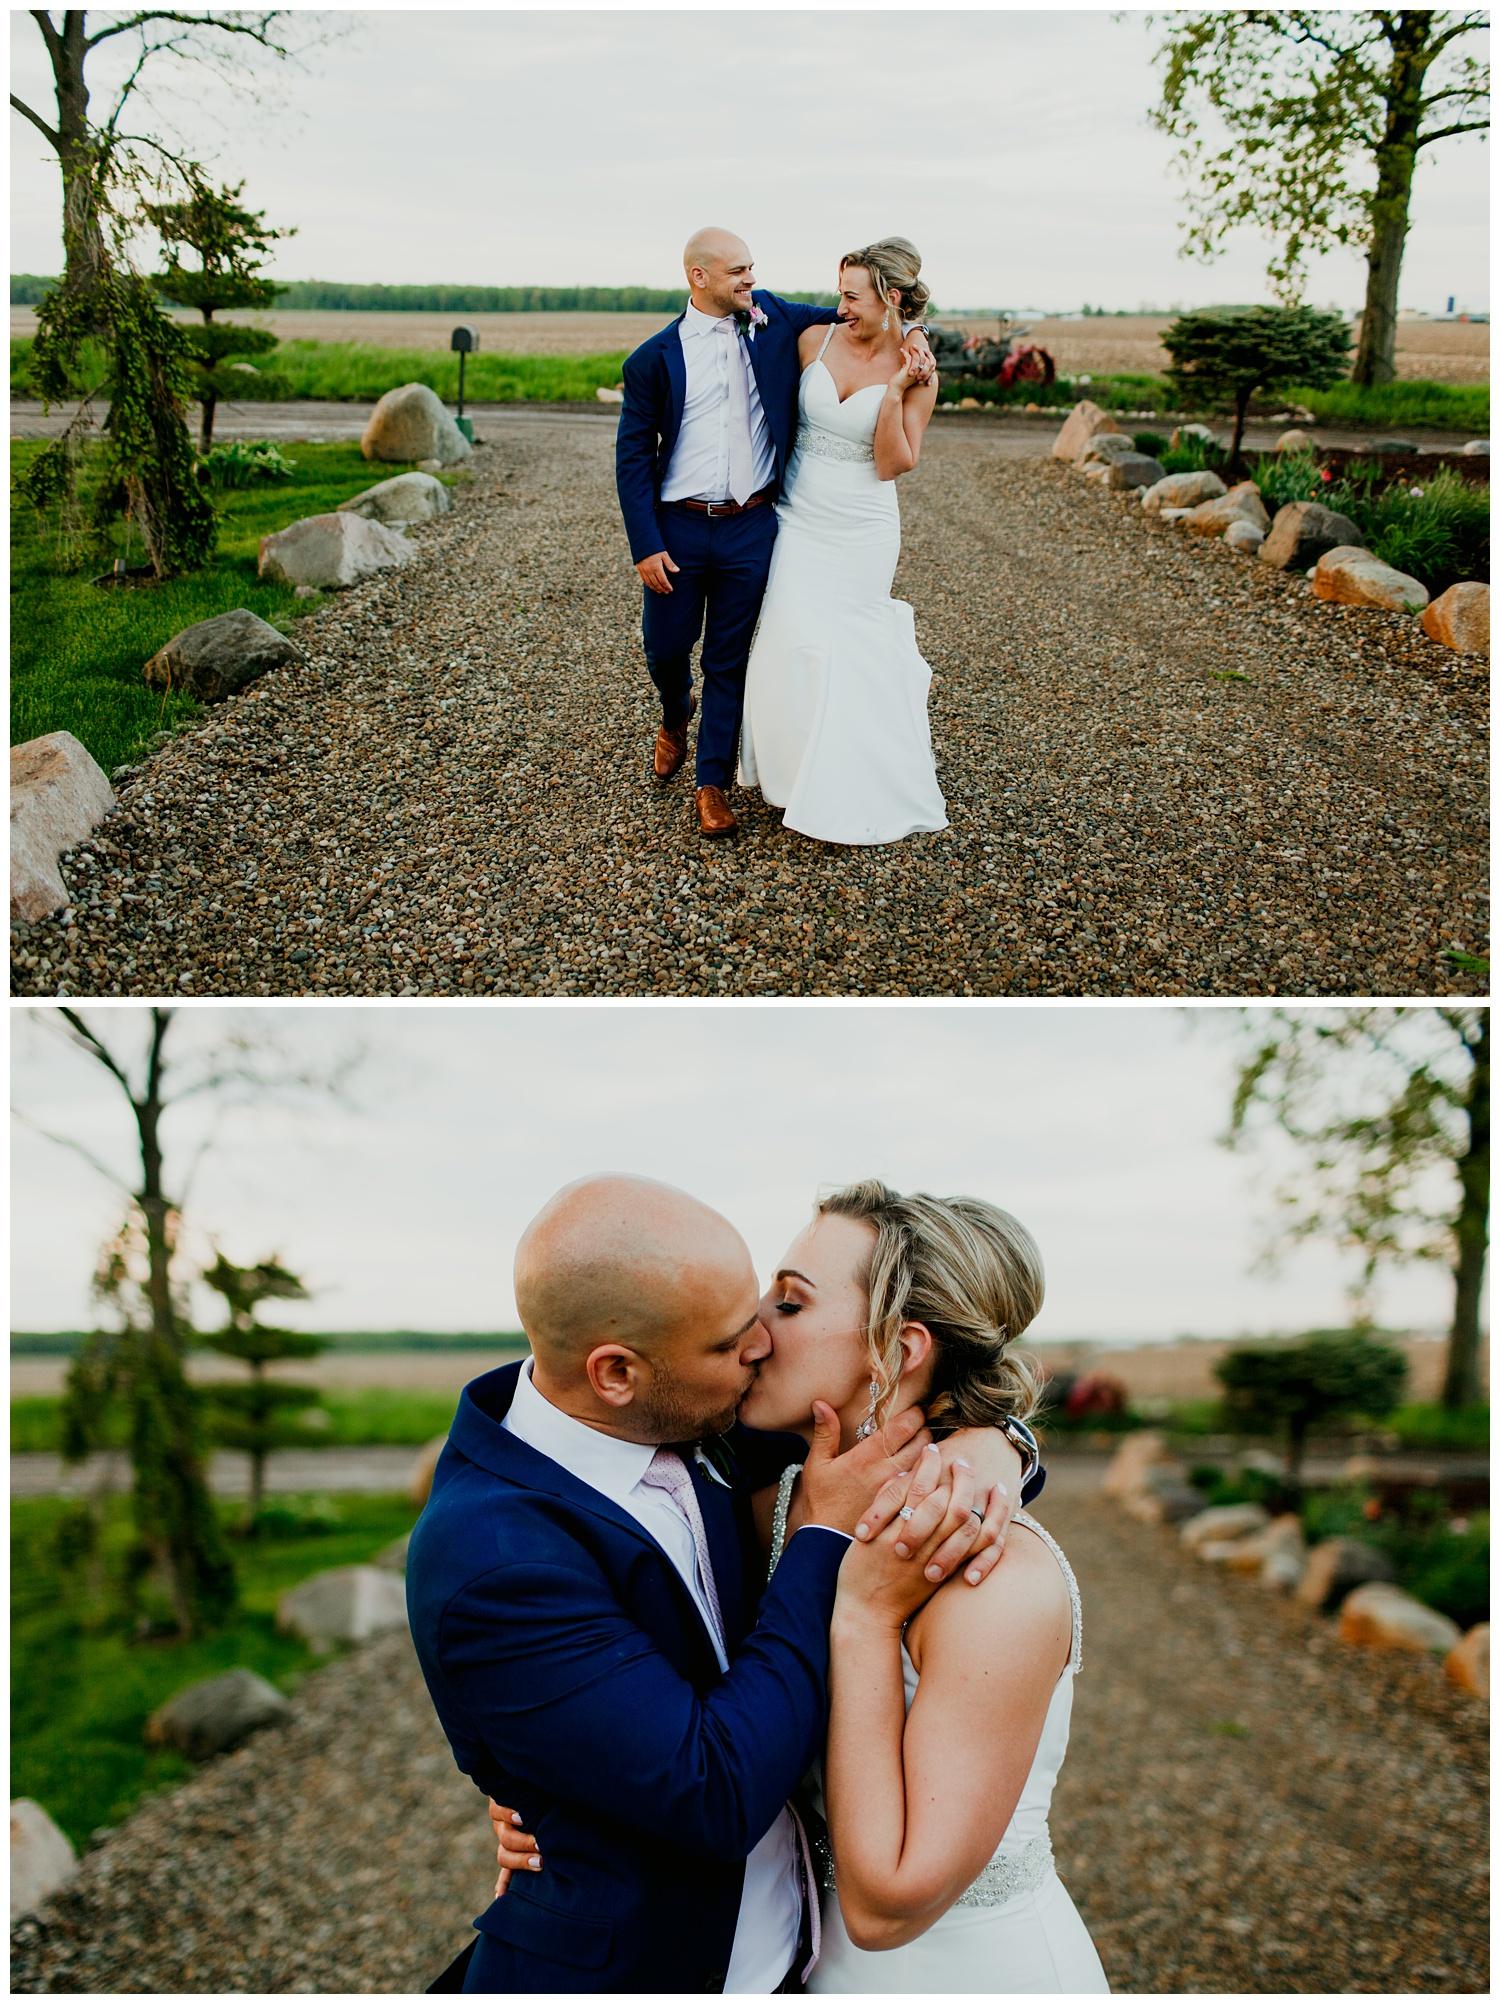 blissfulbarn threeoaks michigan wedding photography journeymandistillery139.jpg